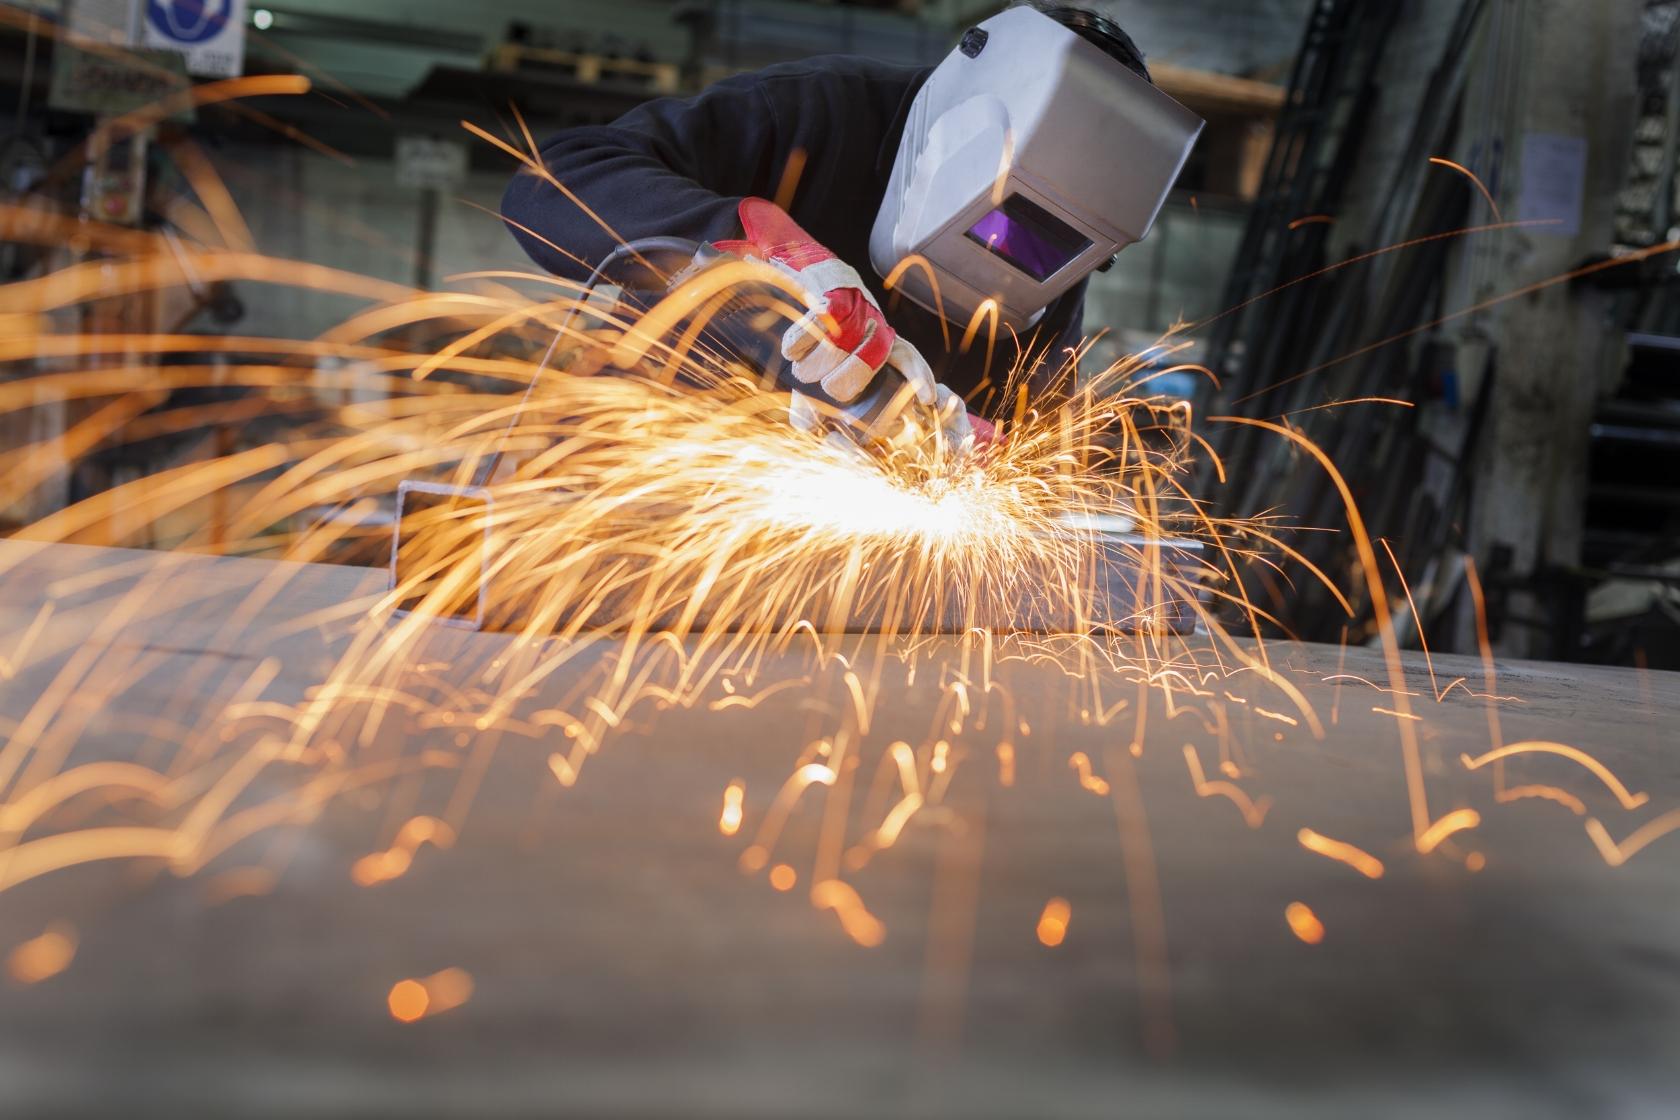 sheetmetal worker.jpg